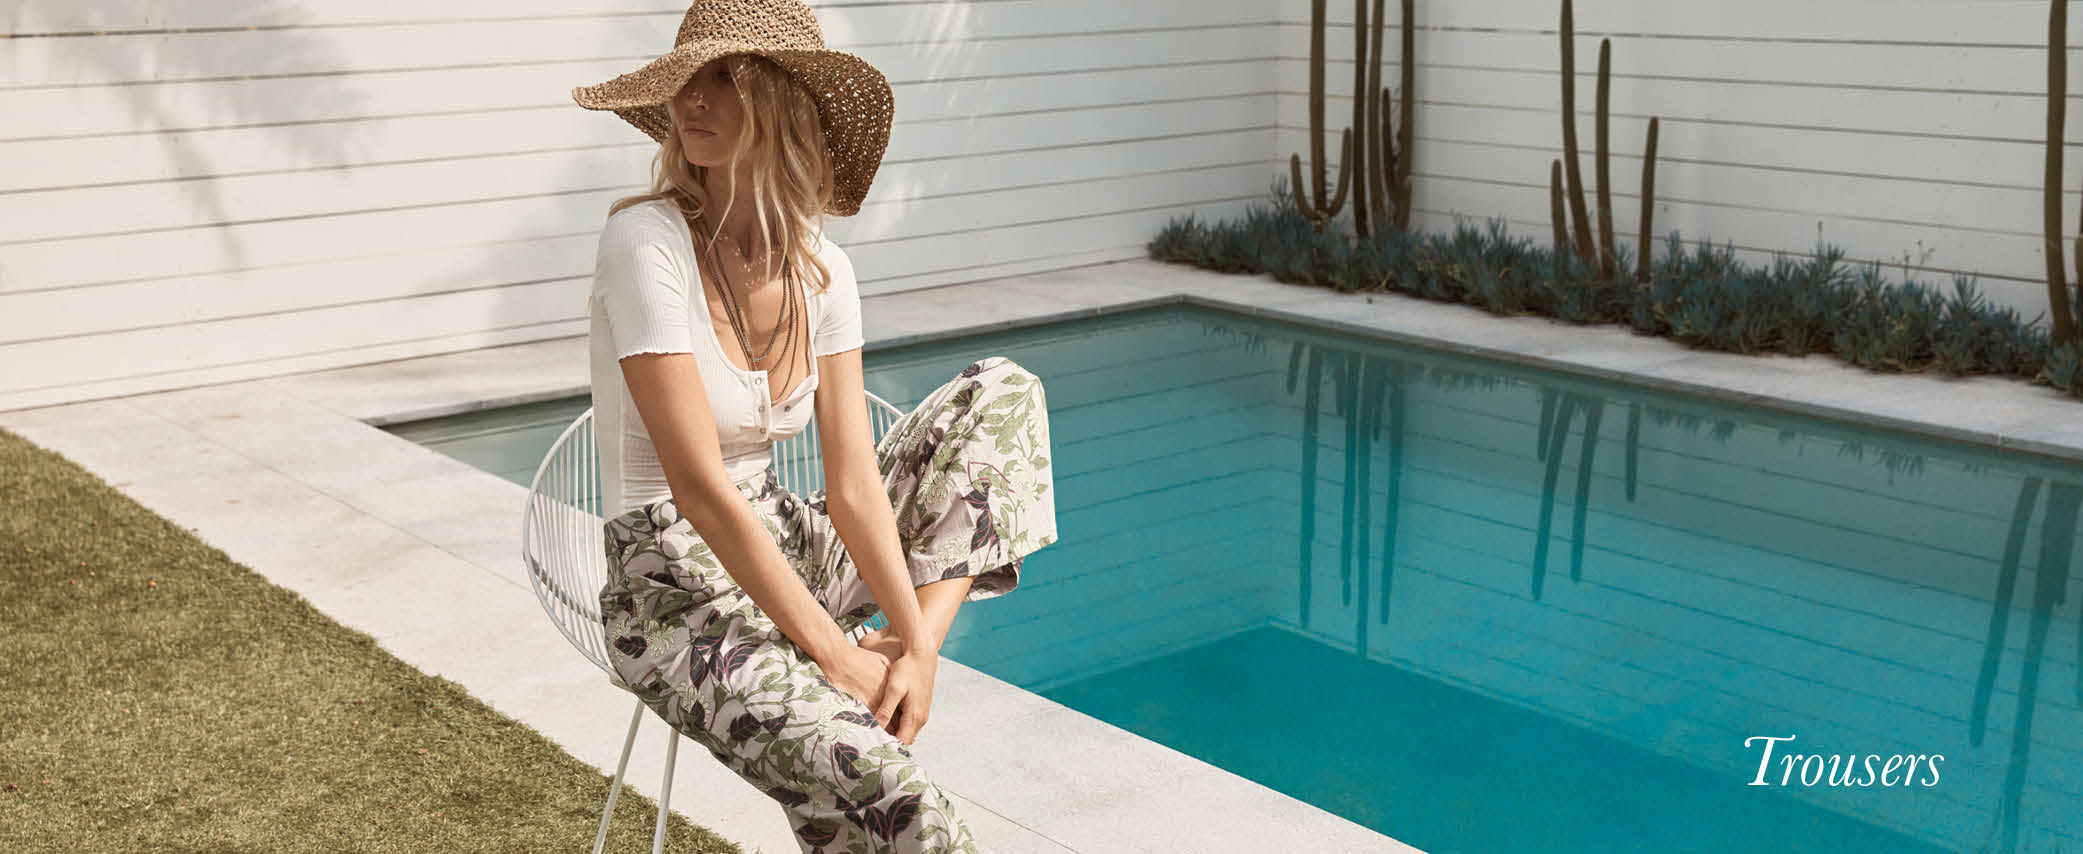 mag-trousers.jpg